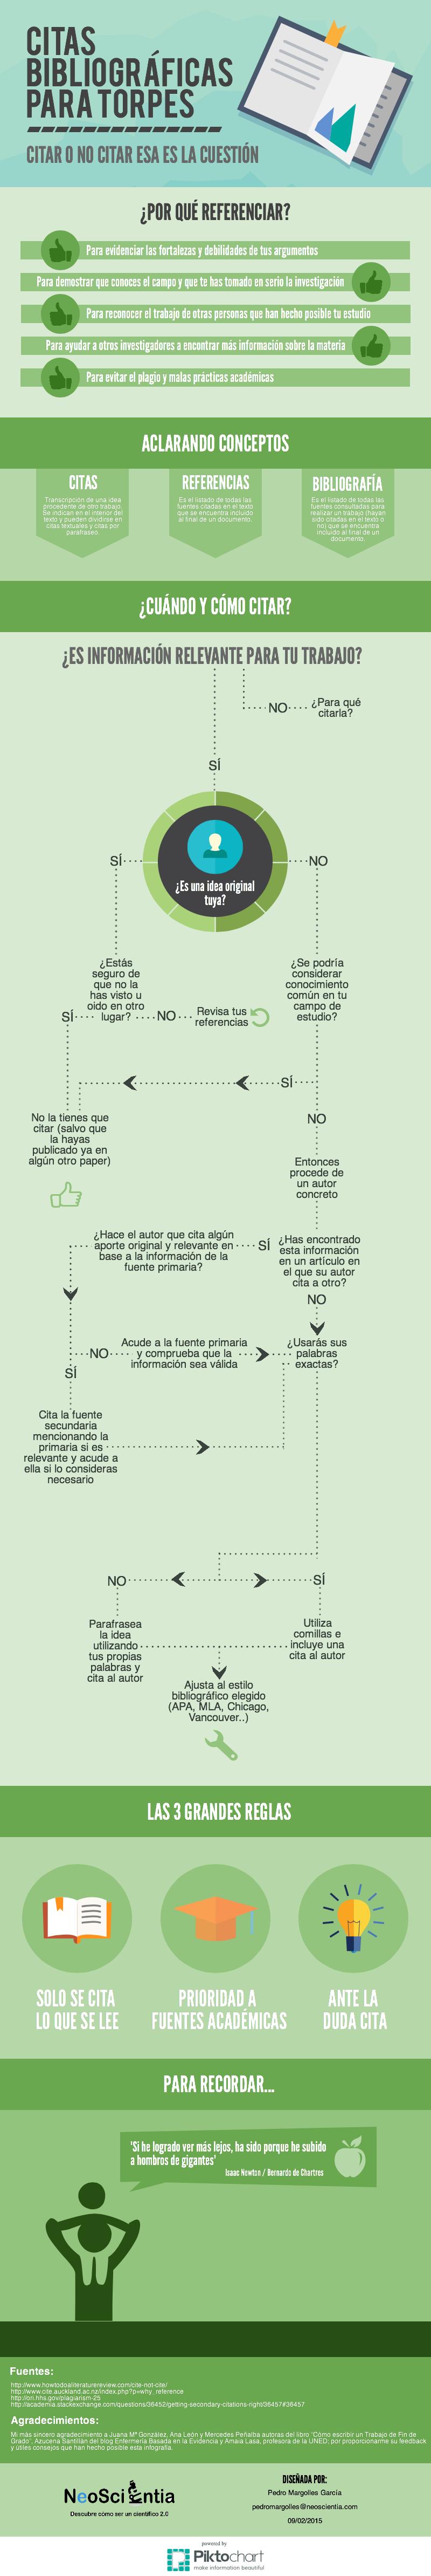 Infografía: Citas bibliográficas para torpes